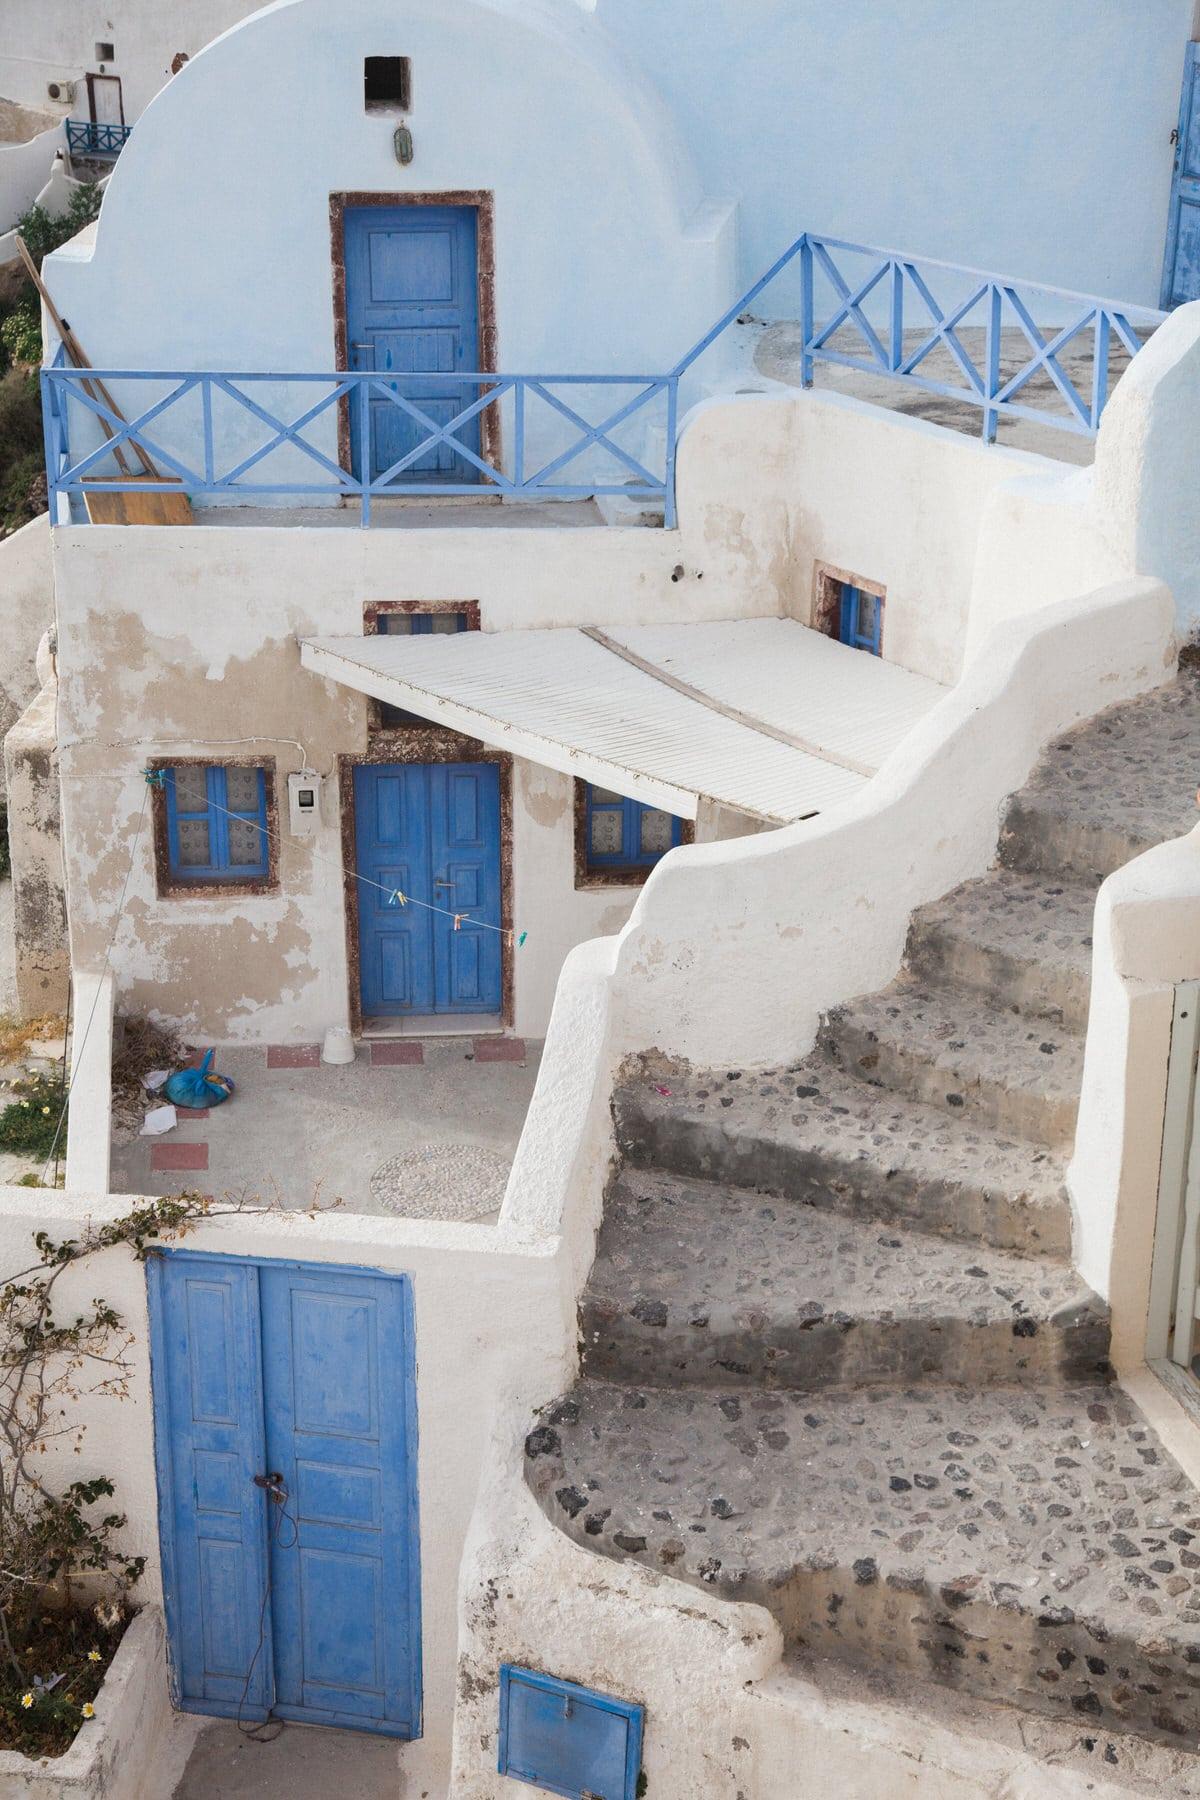 Santorini-Greece-black-and-white-fine-art-photography-by-Studio-L-photographer-Laura-Schneider-_2927